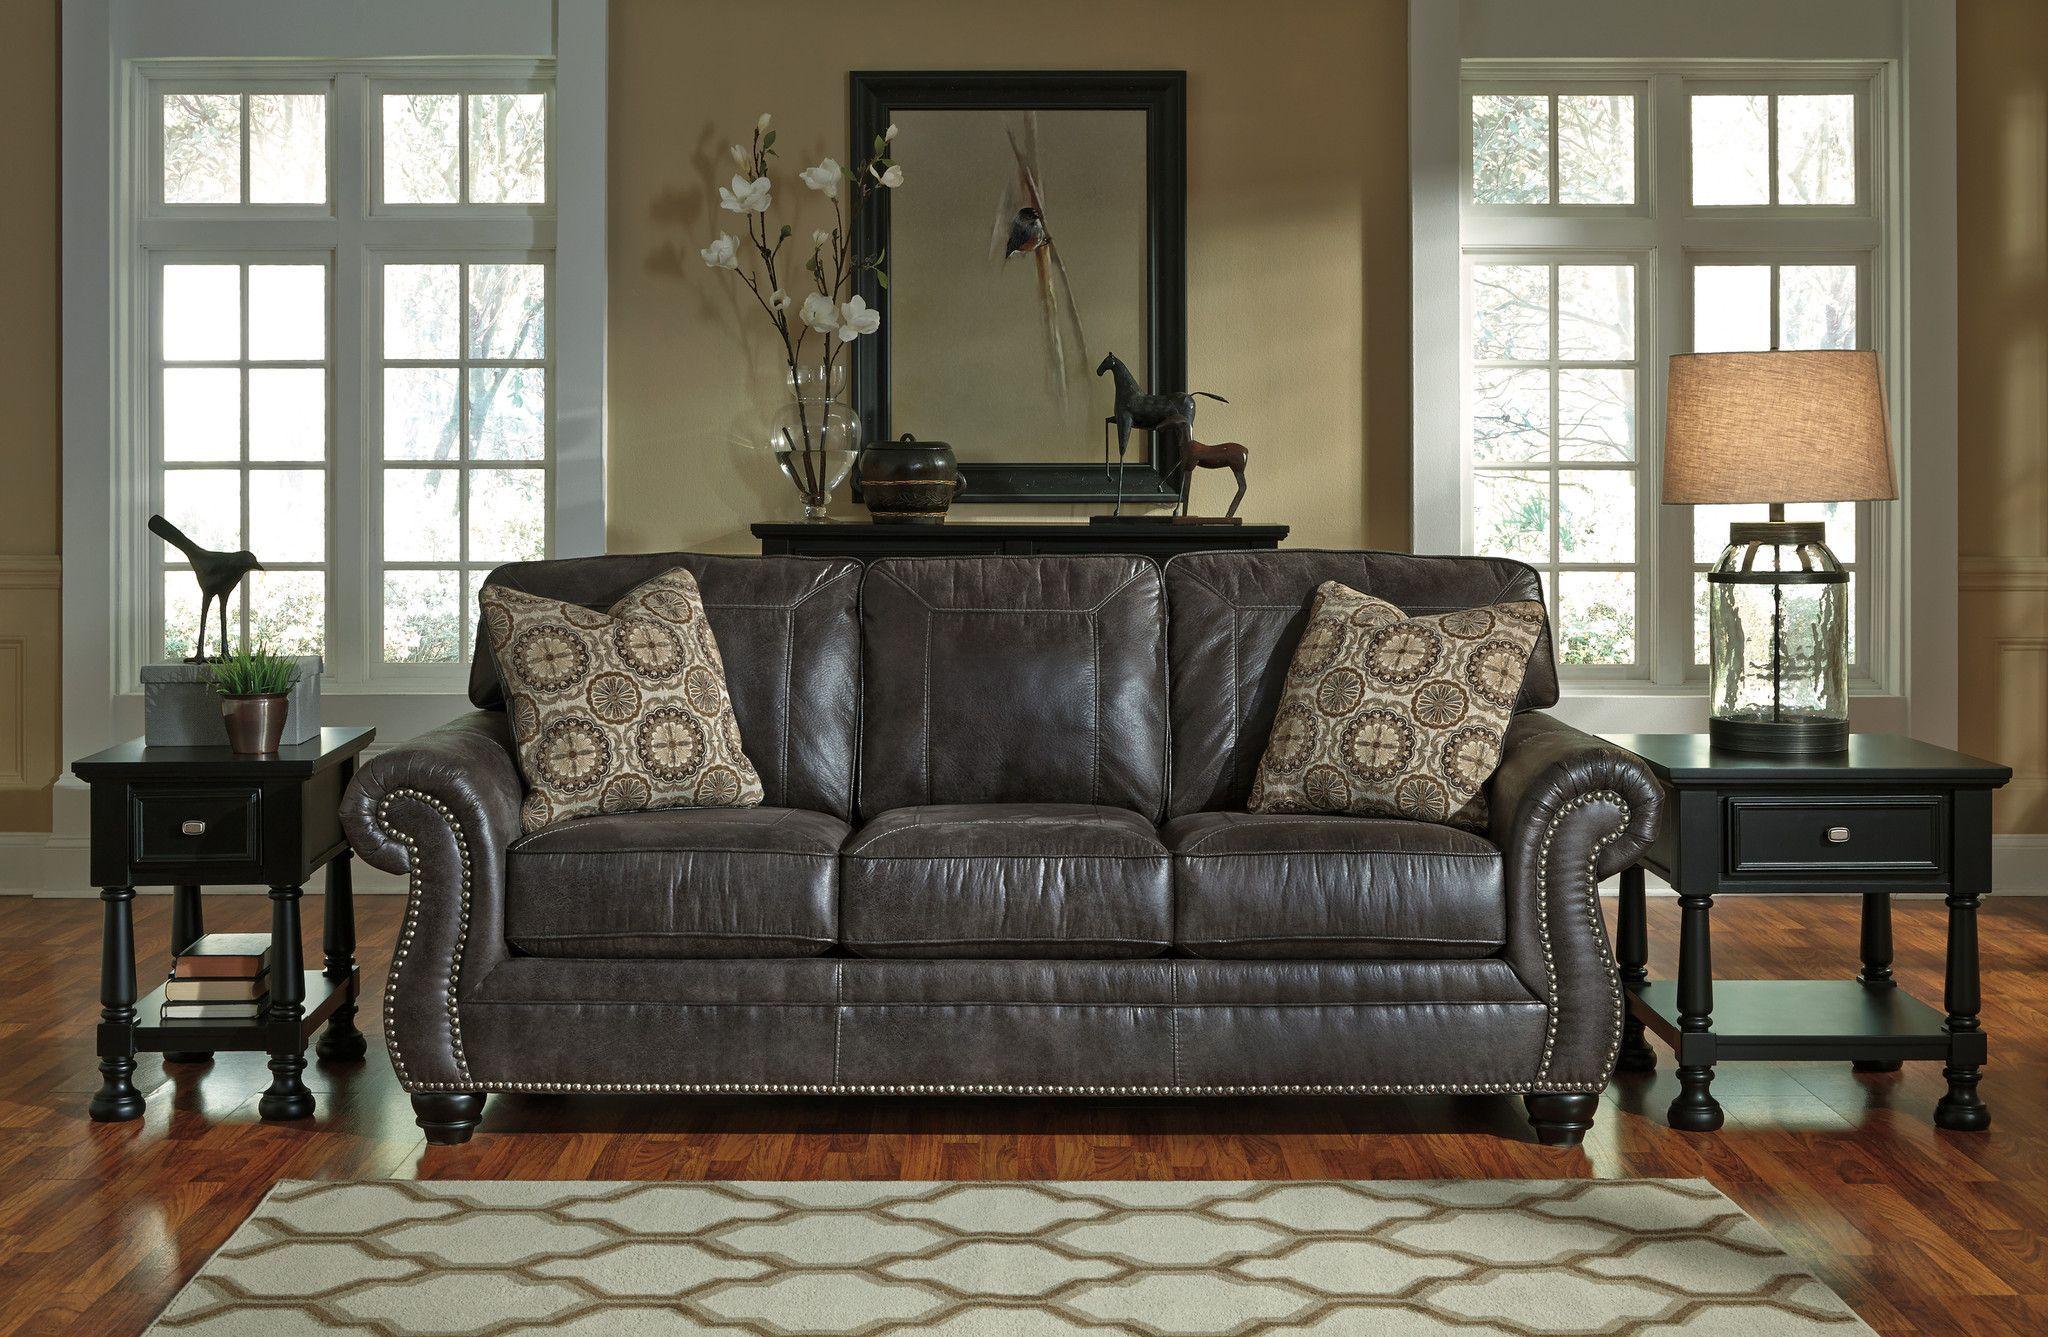 Living Room Sofa Breville Sofa by Ashley Furniture at Kensington